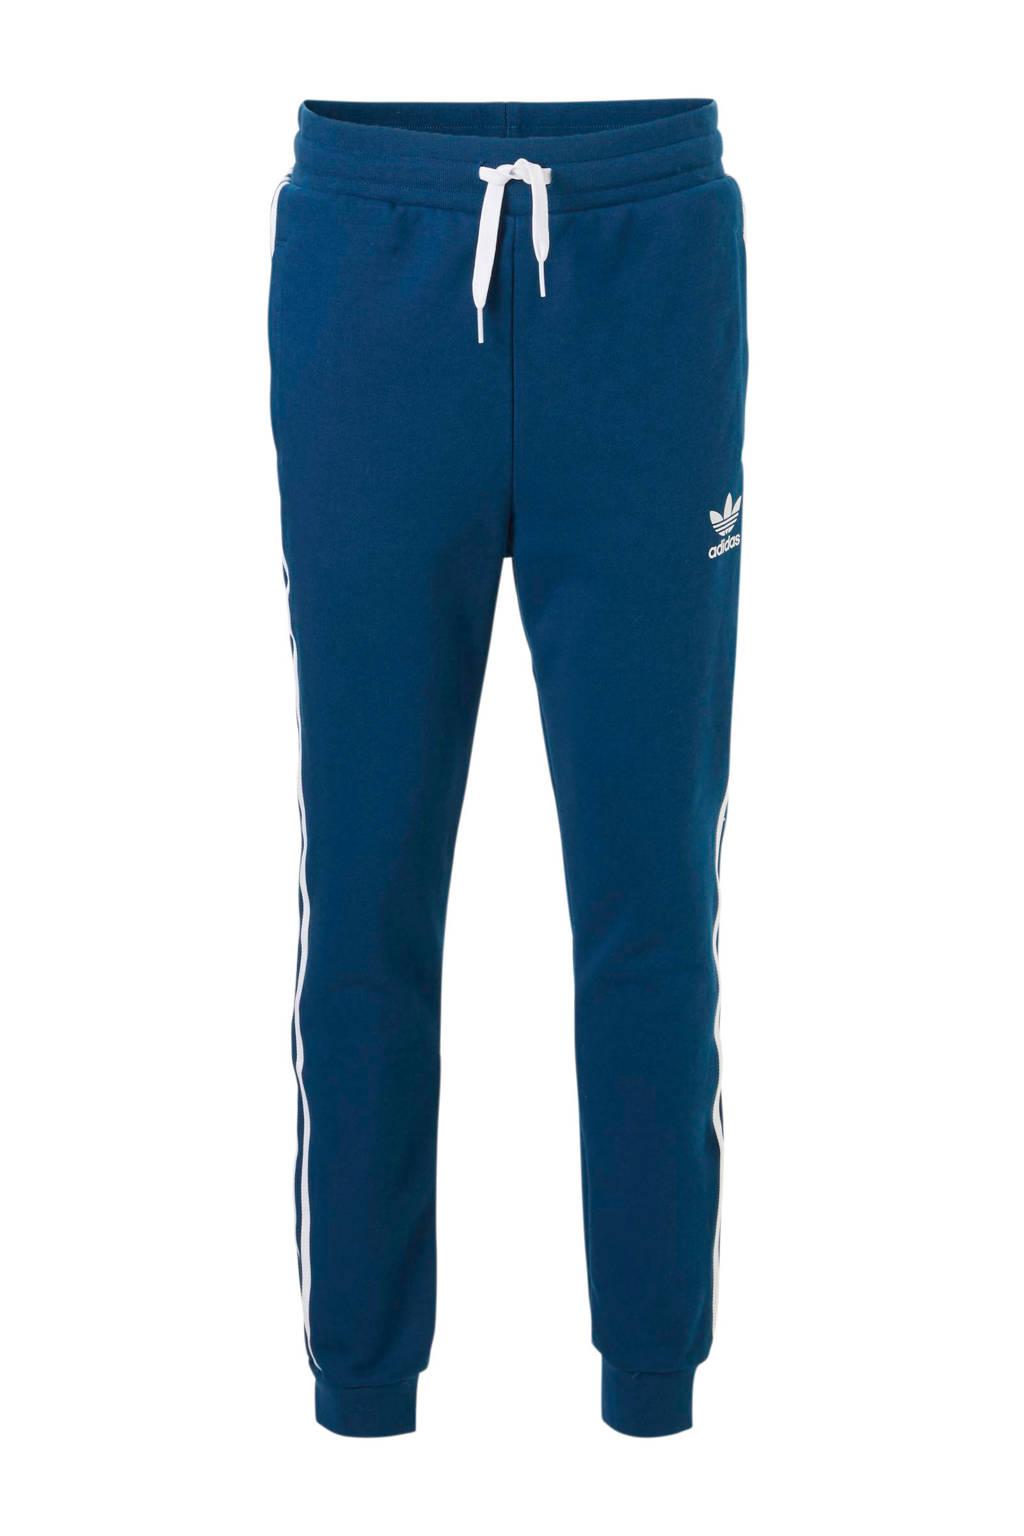 adidas originals   joggingbroek blauw, Blauw/wit